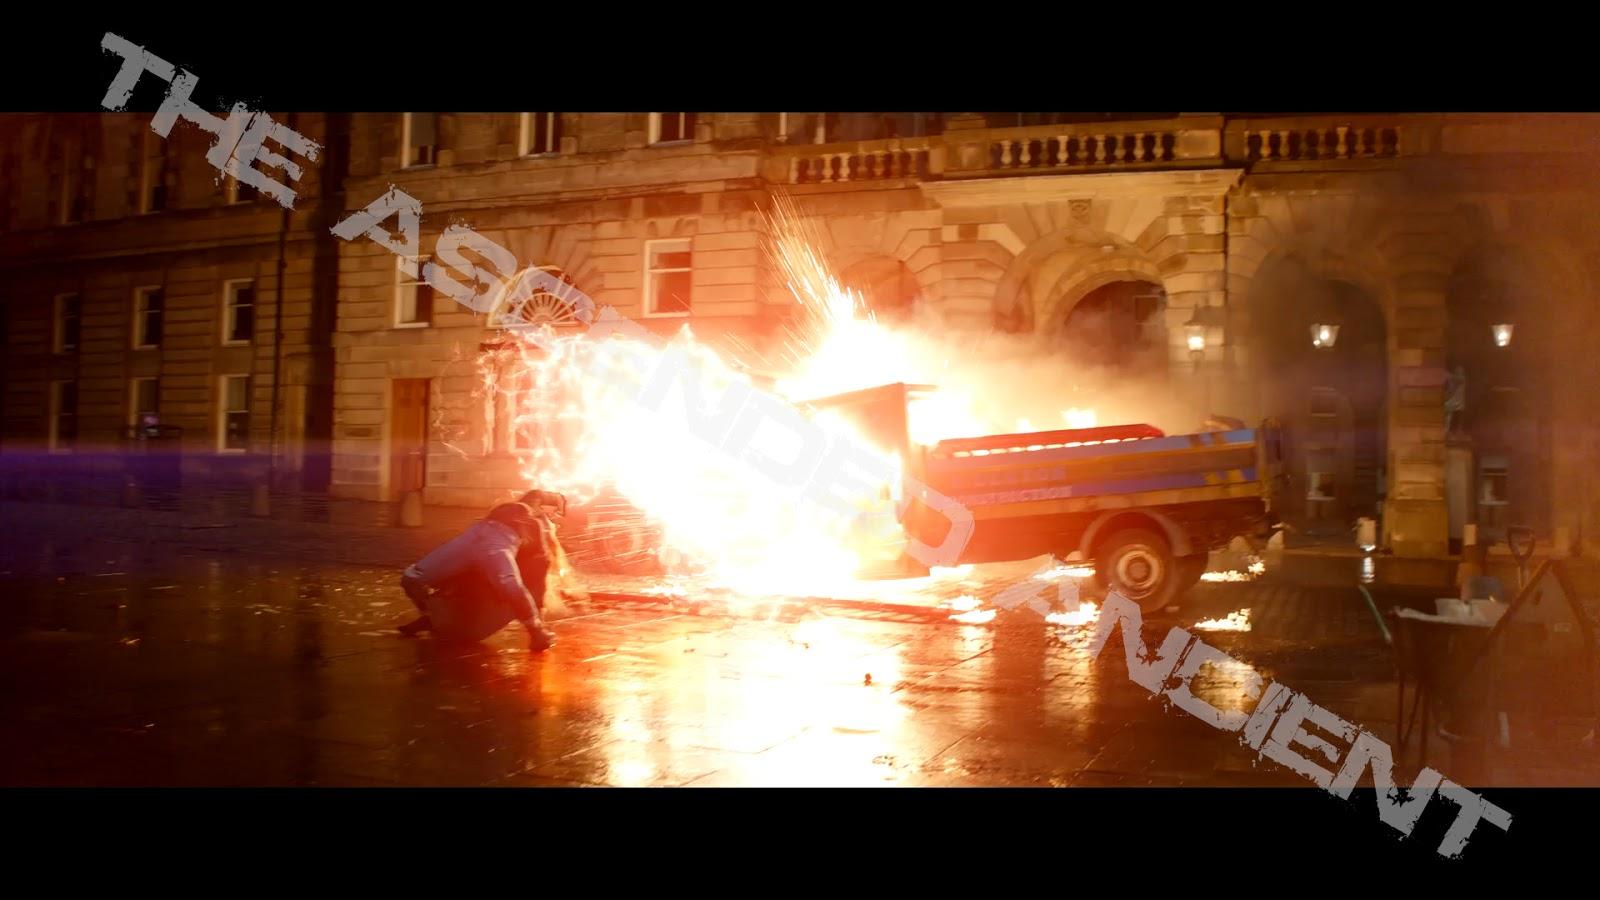 Ванда ведет бой со слугами Таноса: